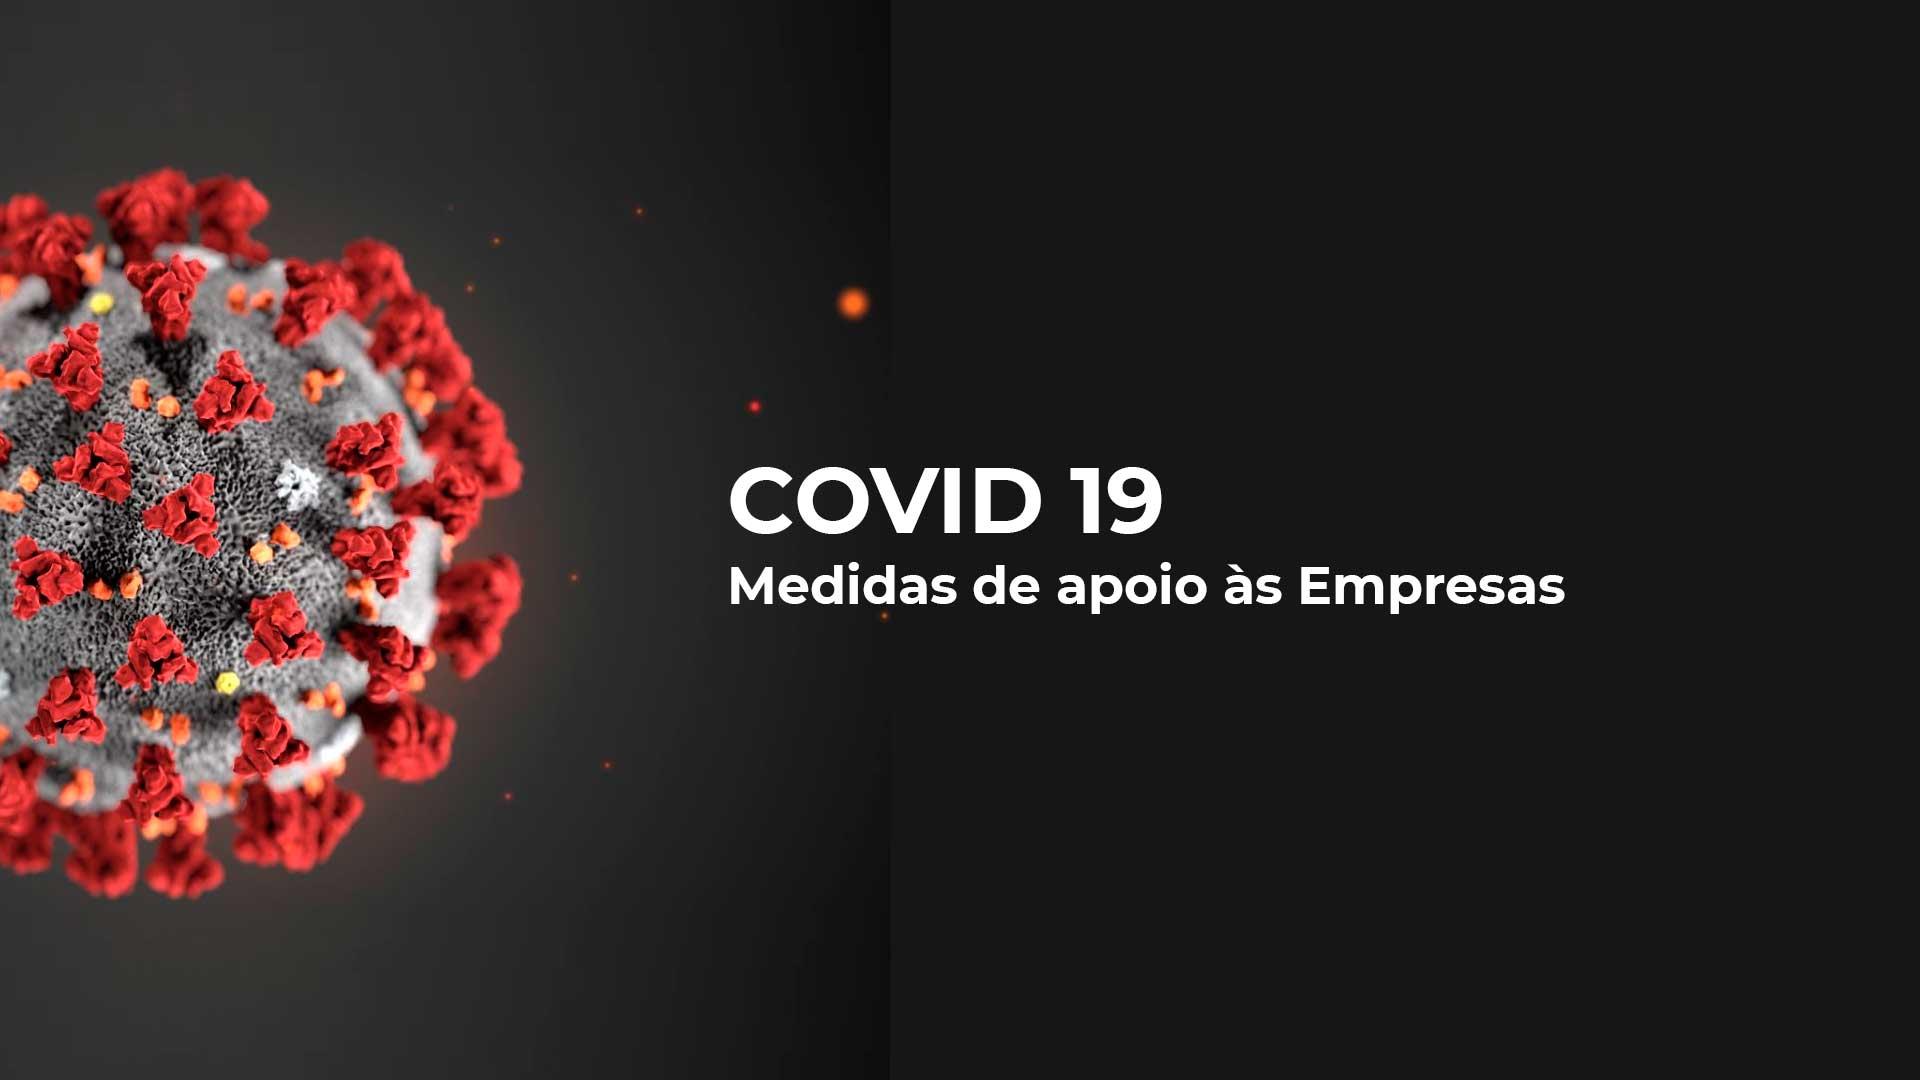 COVID 19 – Medidas de apoio às Empresas